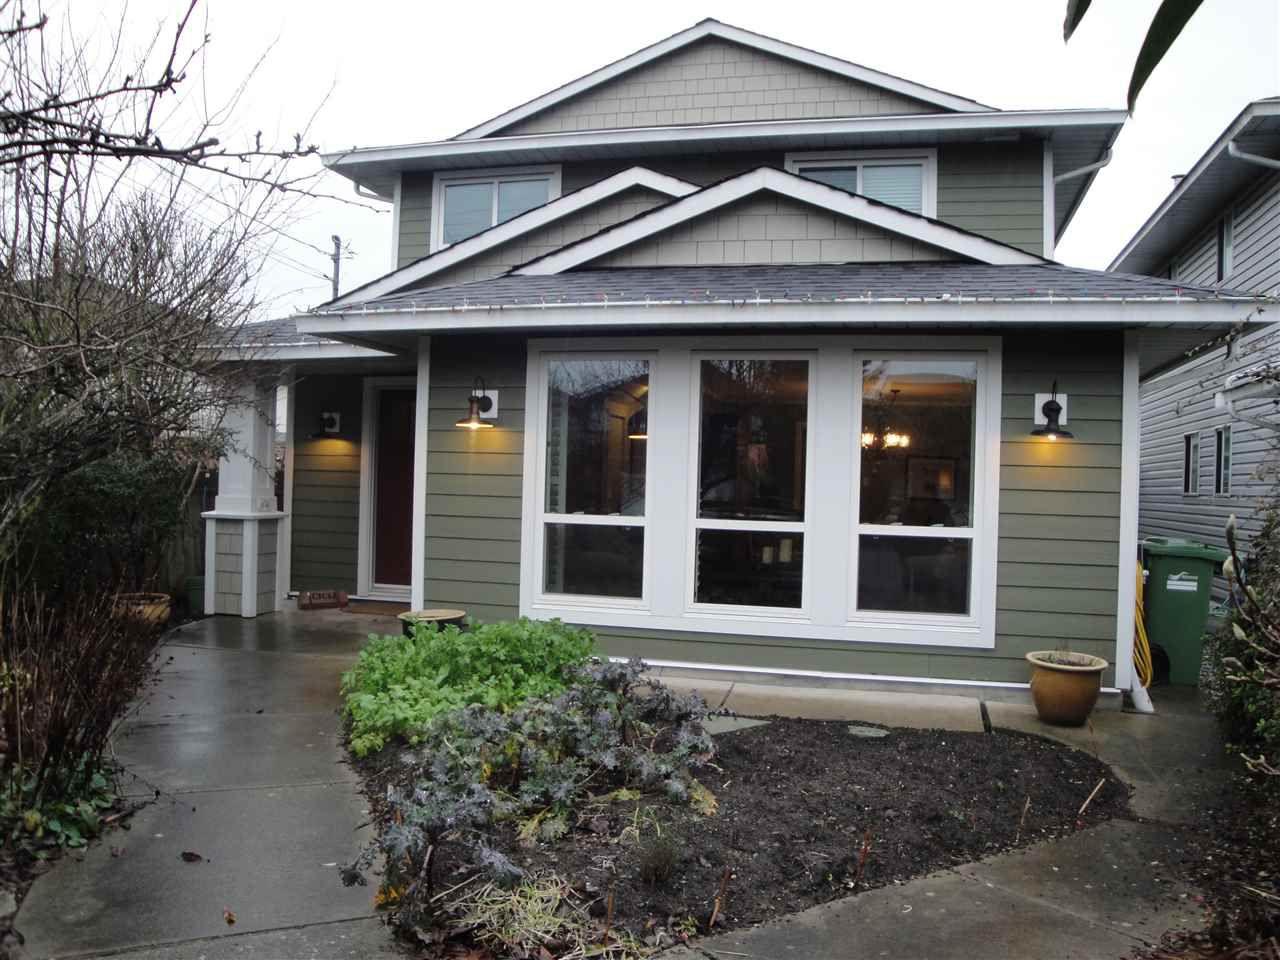 "Main Photo: 3051 HUNT Street in Richmond: Steveston Villlage House for sale in ""Steveston Village"" : MLS®# R2027439"